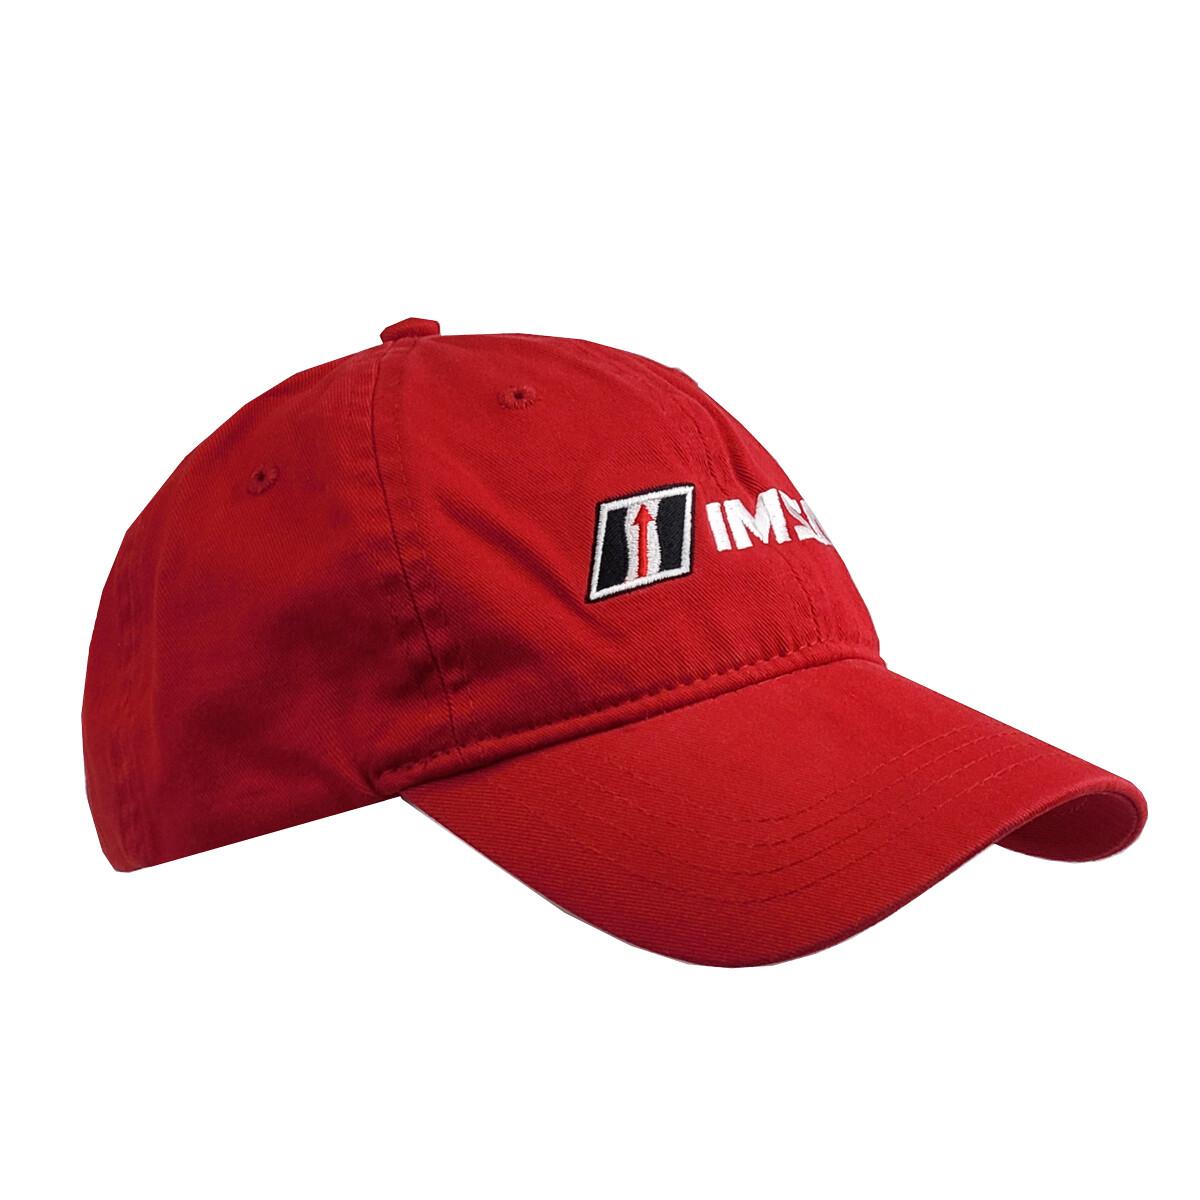 IMSA Slouch Hat - Red